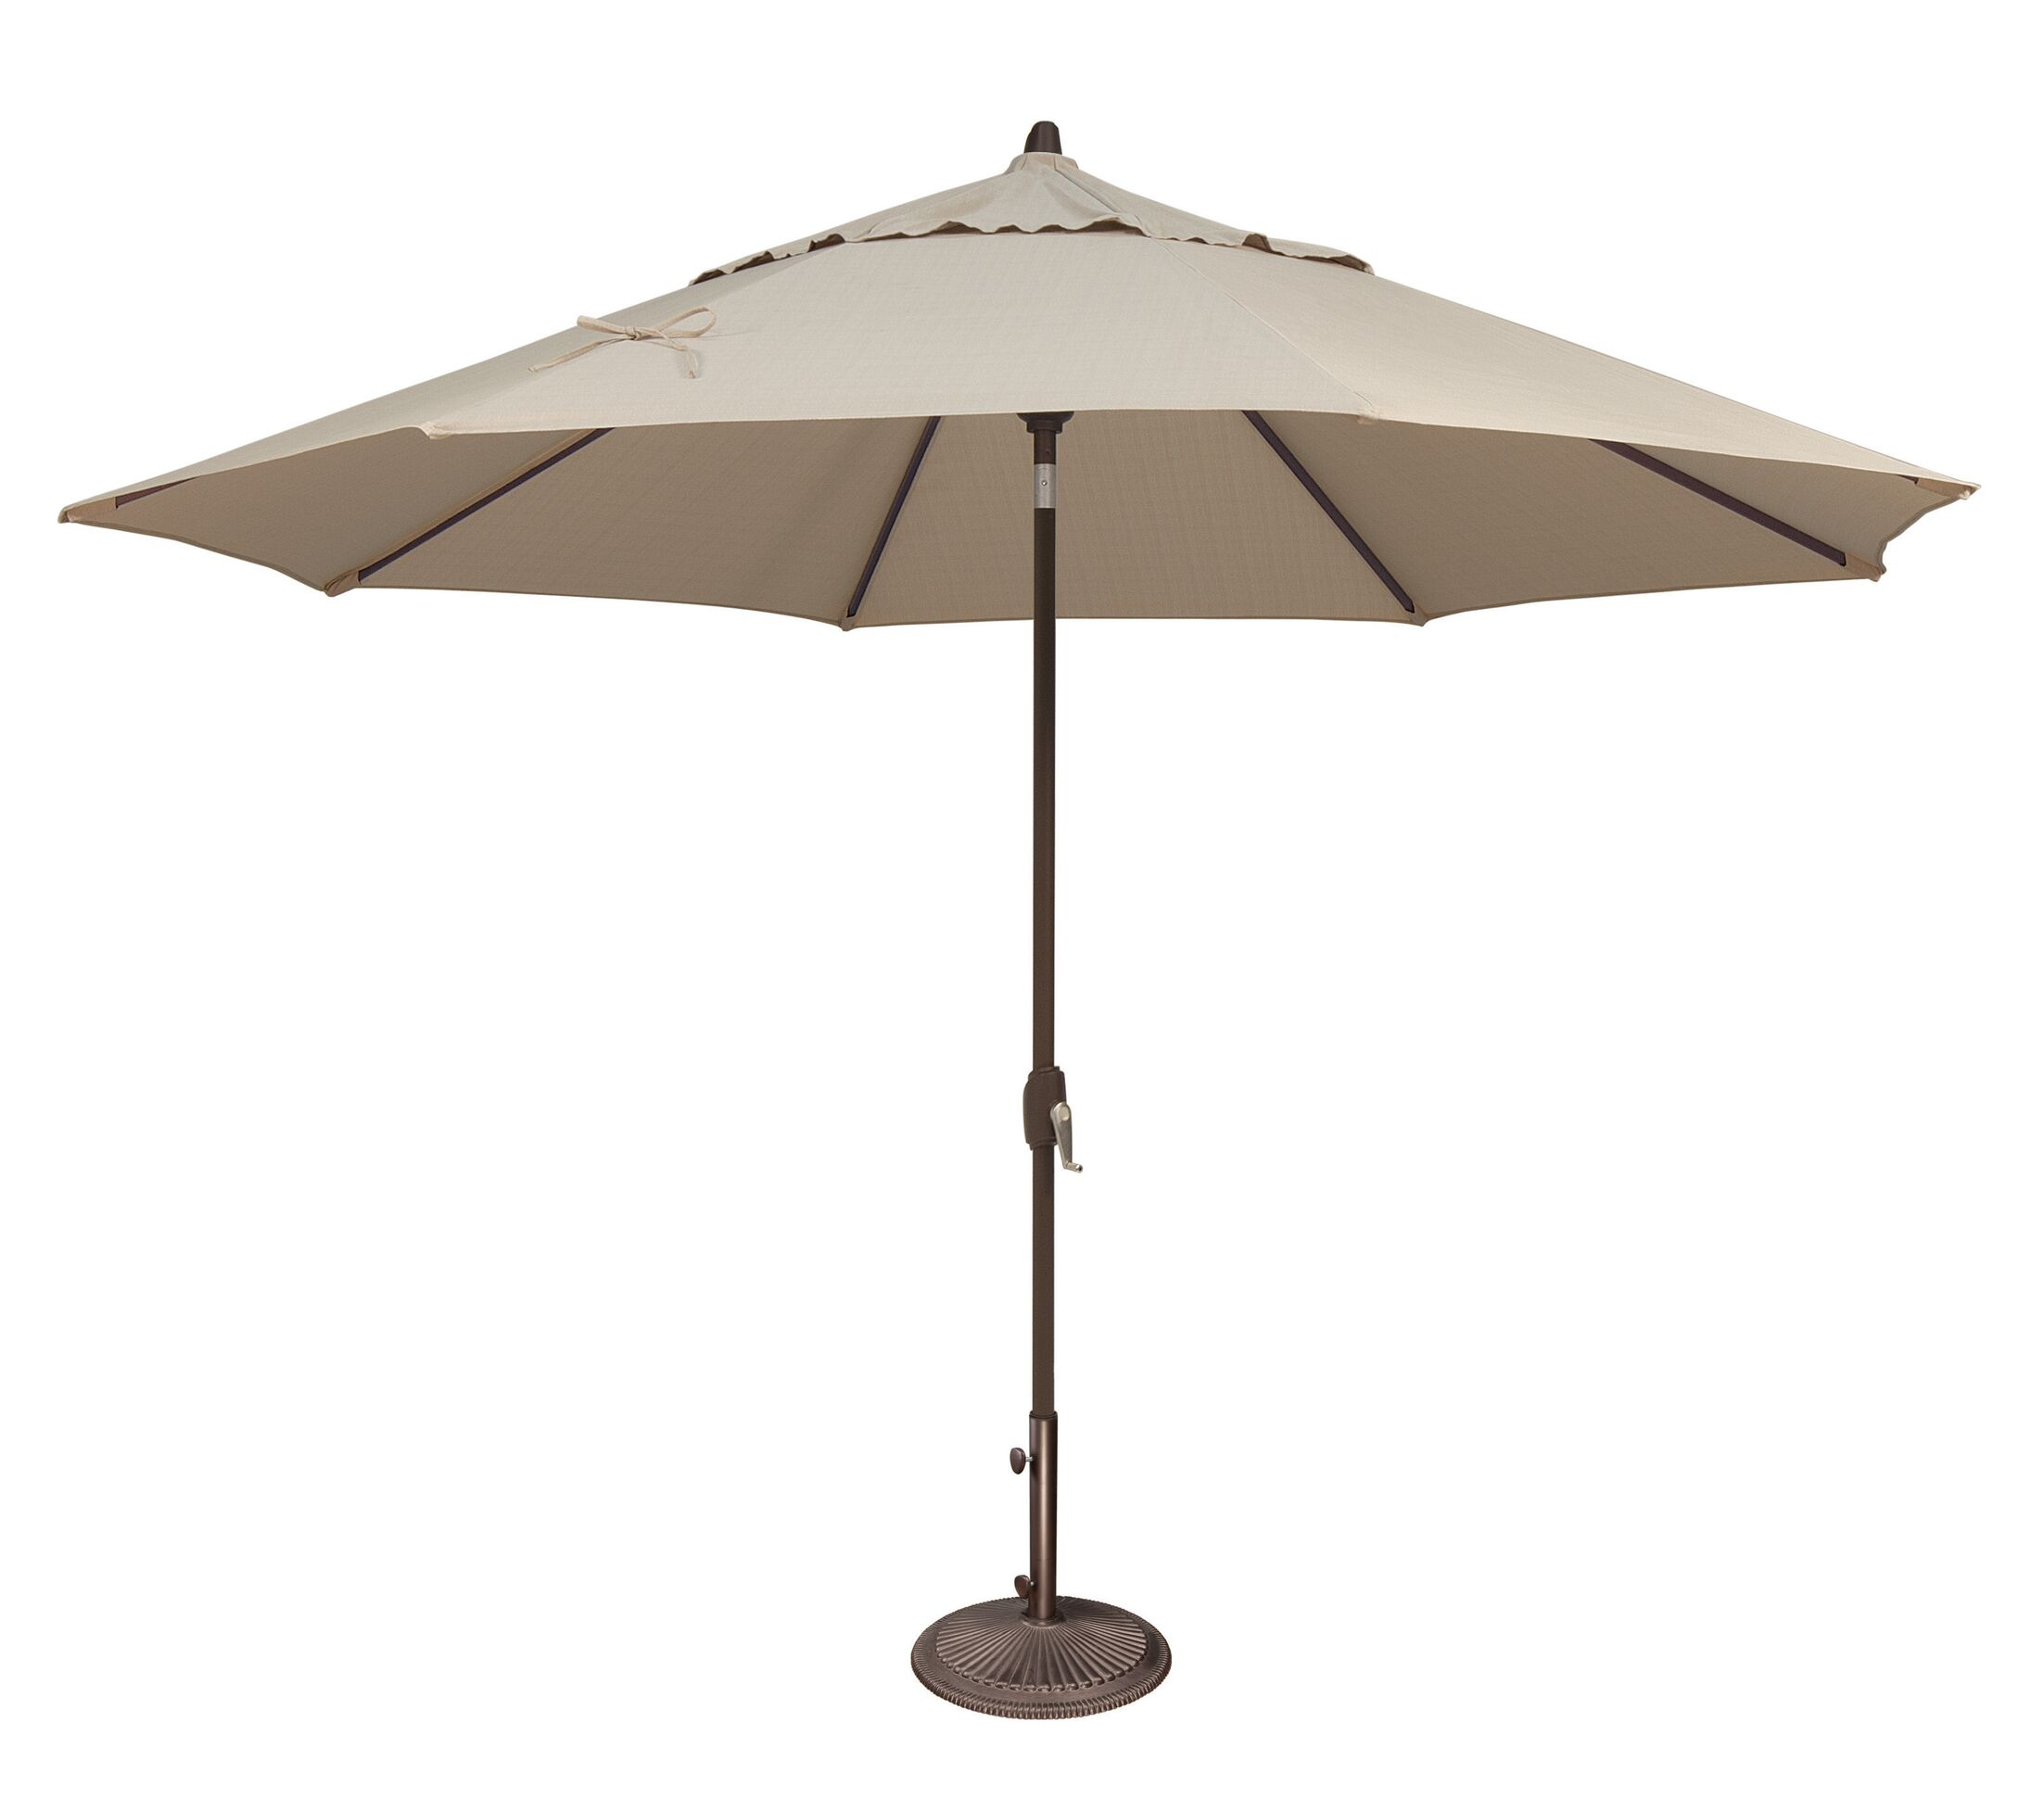 Lanai 11' Market Umbrella Fabric: Solefin / Beige